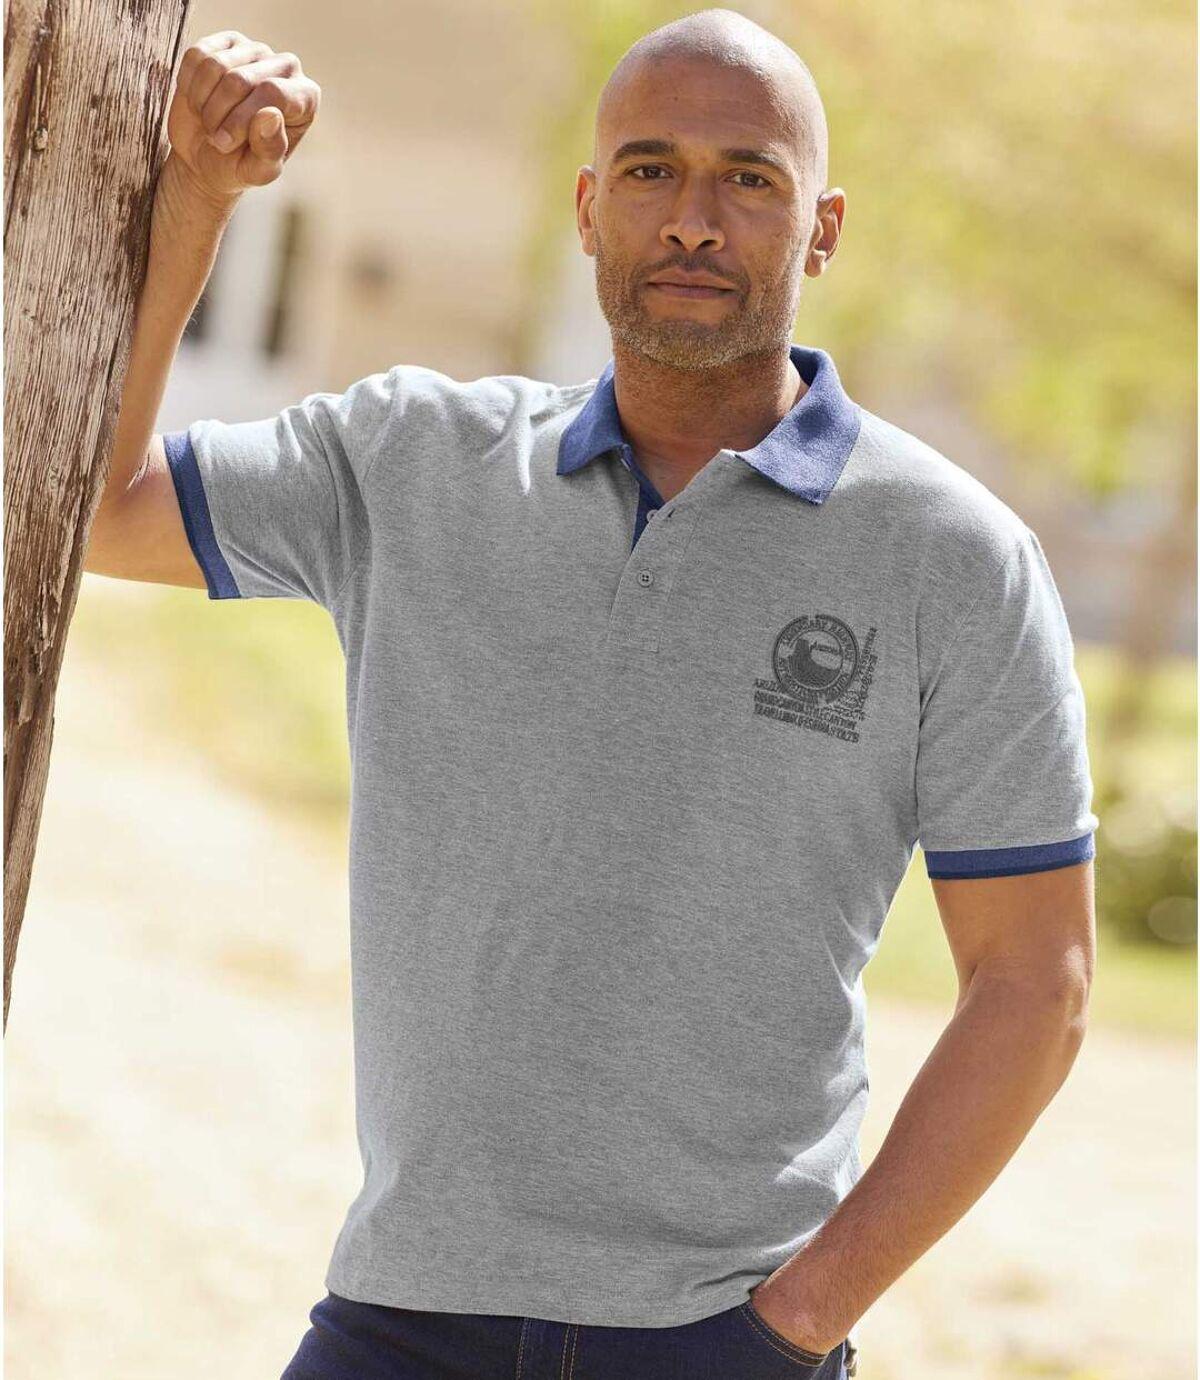 Pack of 2 Men's Short Sleeve Polo Shirts - Blue Grey Atlas For Men